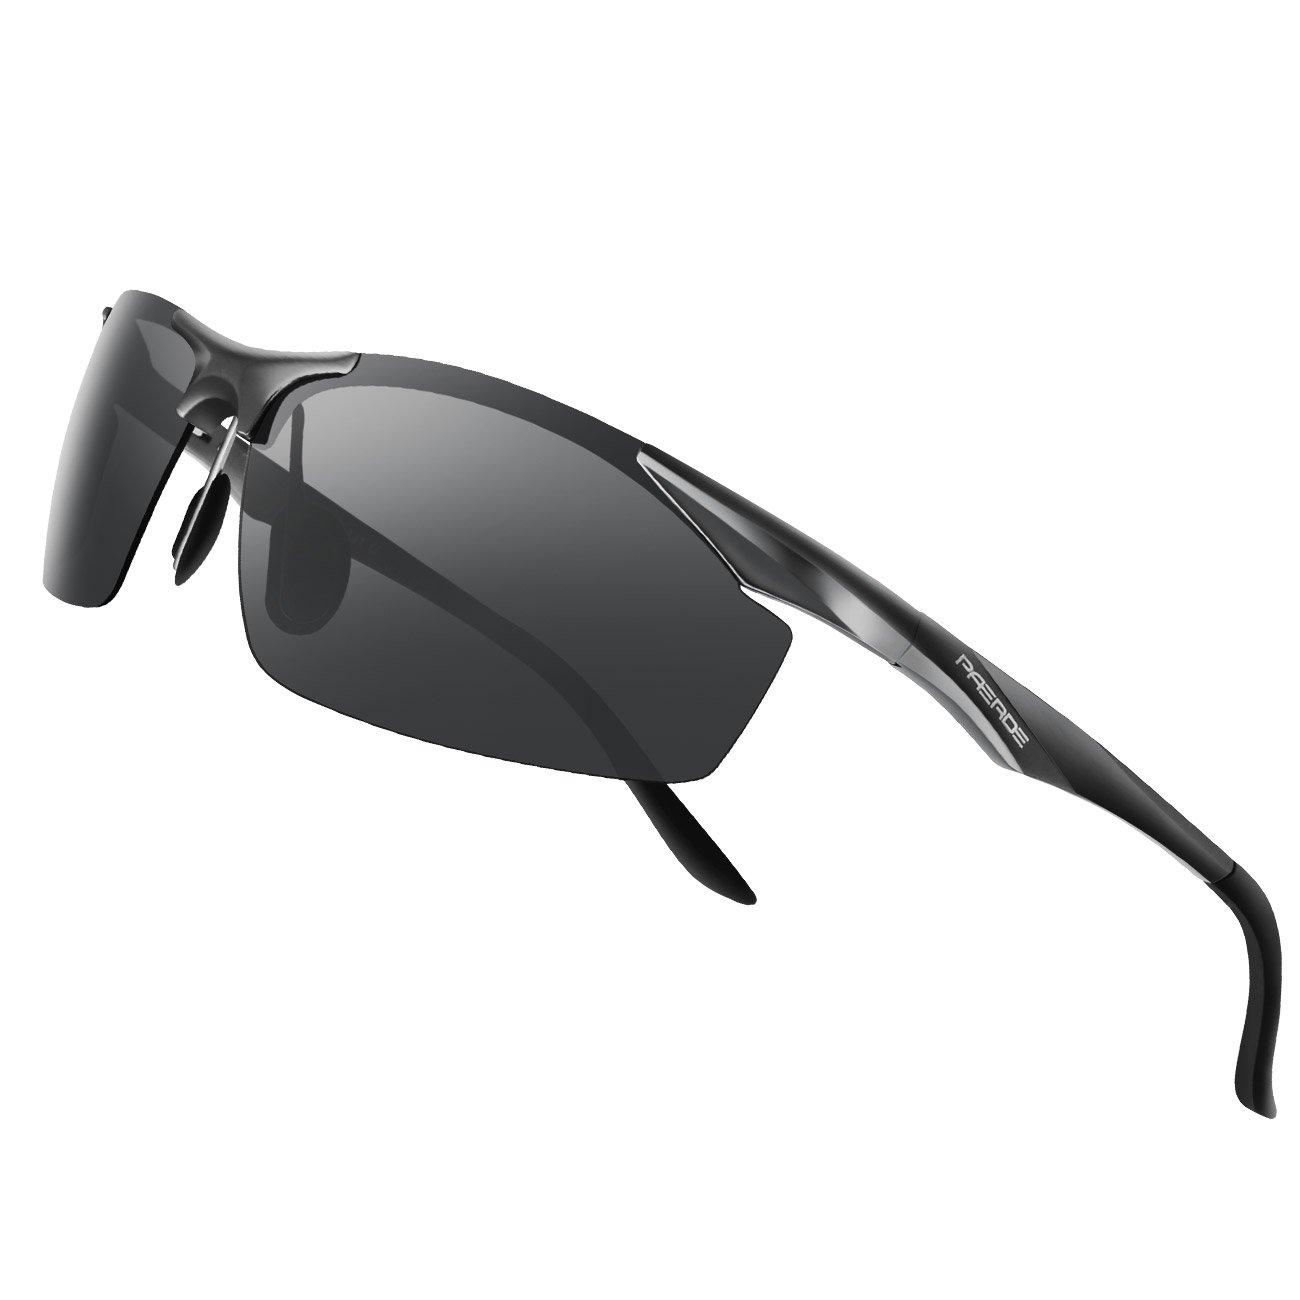 PAERDE Men\'s Sports Style Polarized Sunglasses for Men Driving Fishing Cycling Golf Running Al-Mg Metal Frame Ultra Light Glasses (Black)